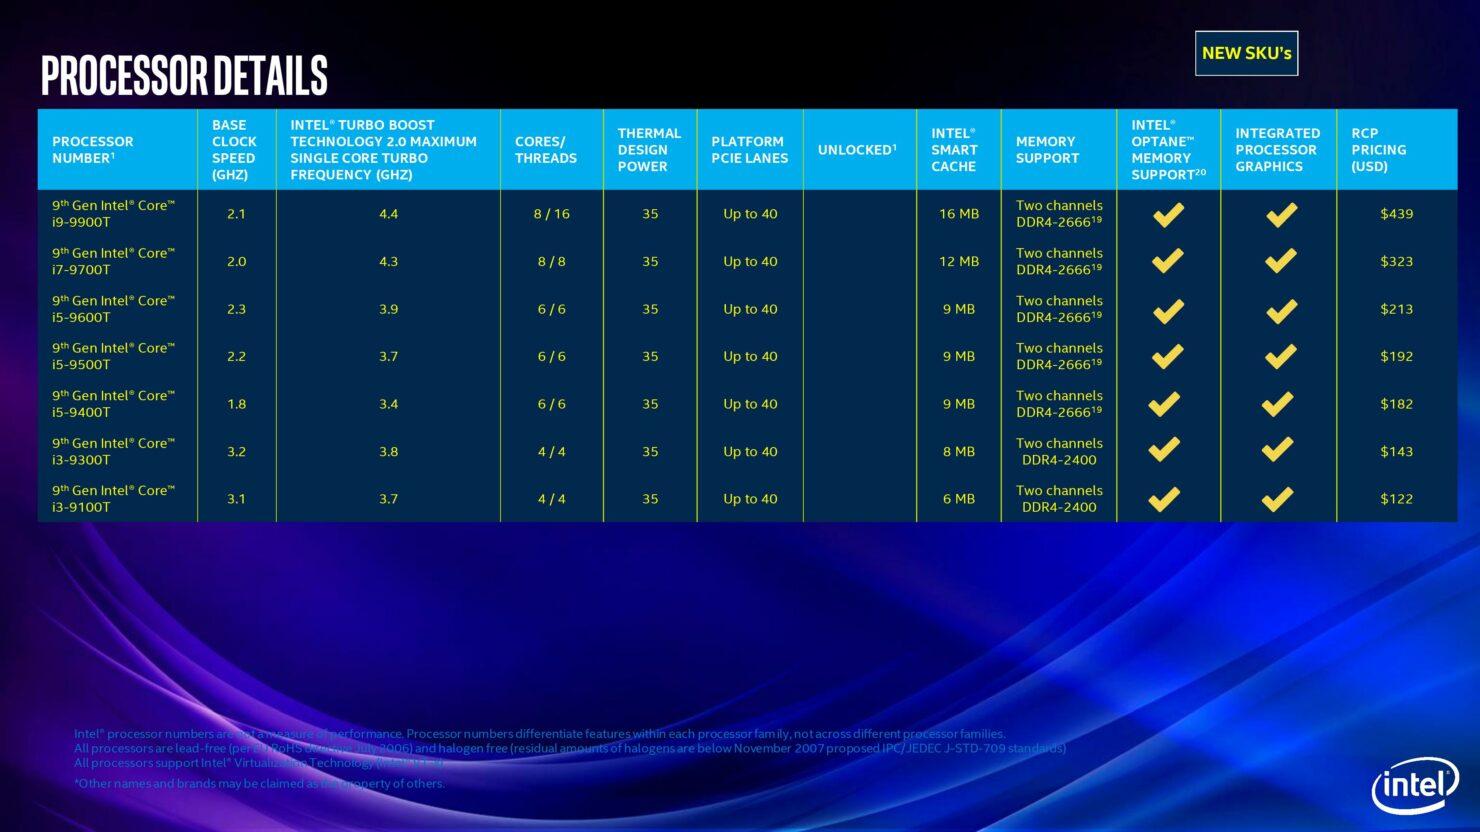 9th-gen-intel-core-mobile-launch-presentation-under-nda-until-april-23-page-024